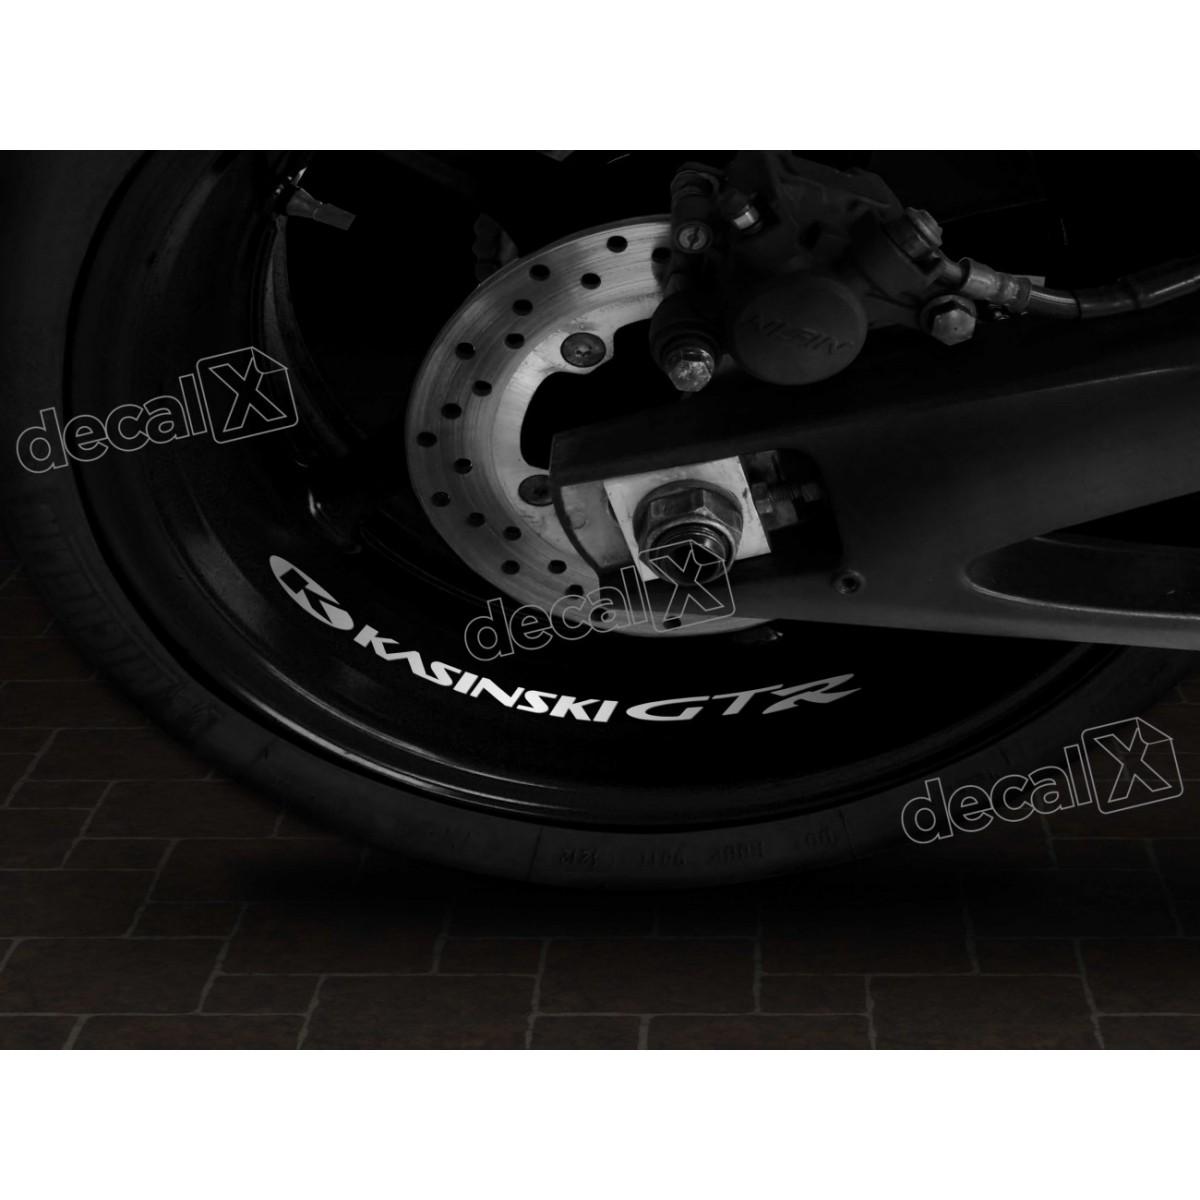 Adesivos Centro Roda Refletivo Moto Kasinski Gtr Rd6